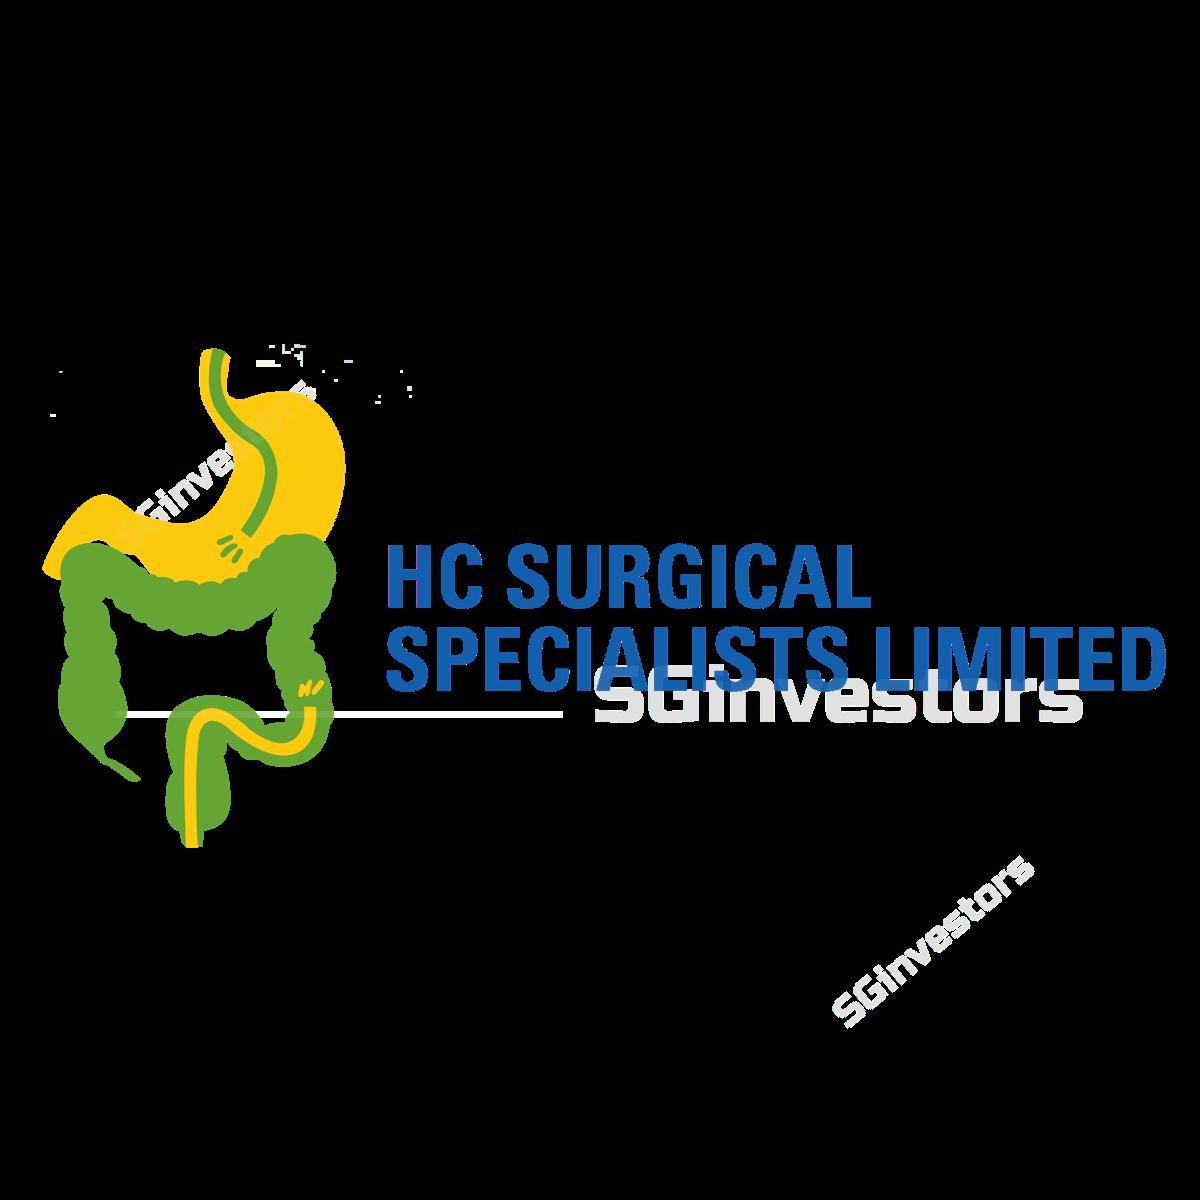 HC SURGICAL SPECIALISTSLIMITED (SGX:1B1) | SGinvestors.io